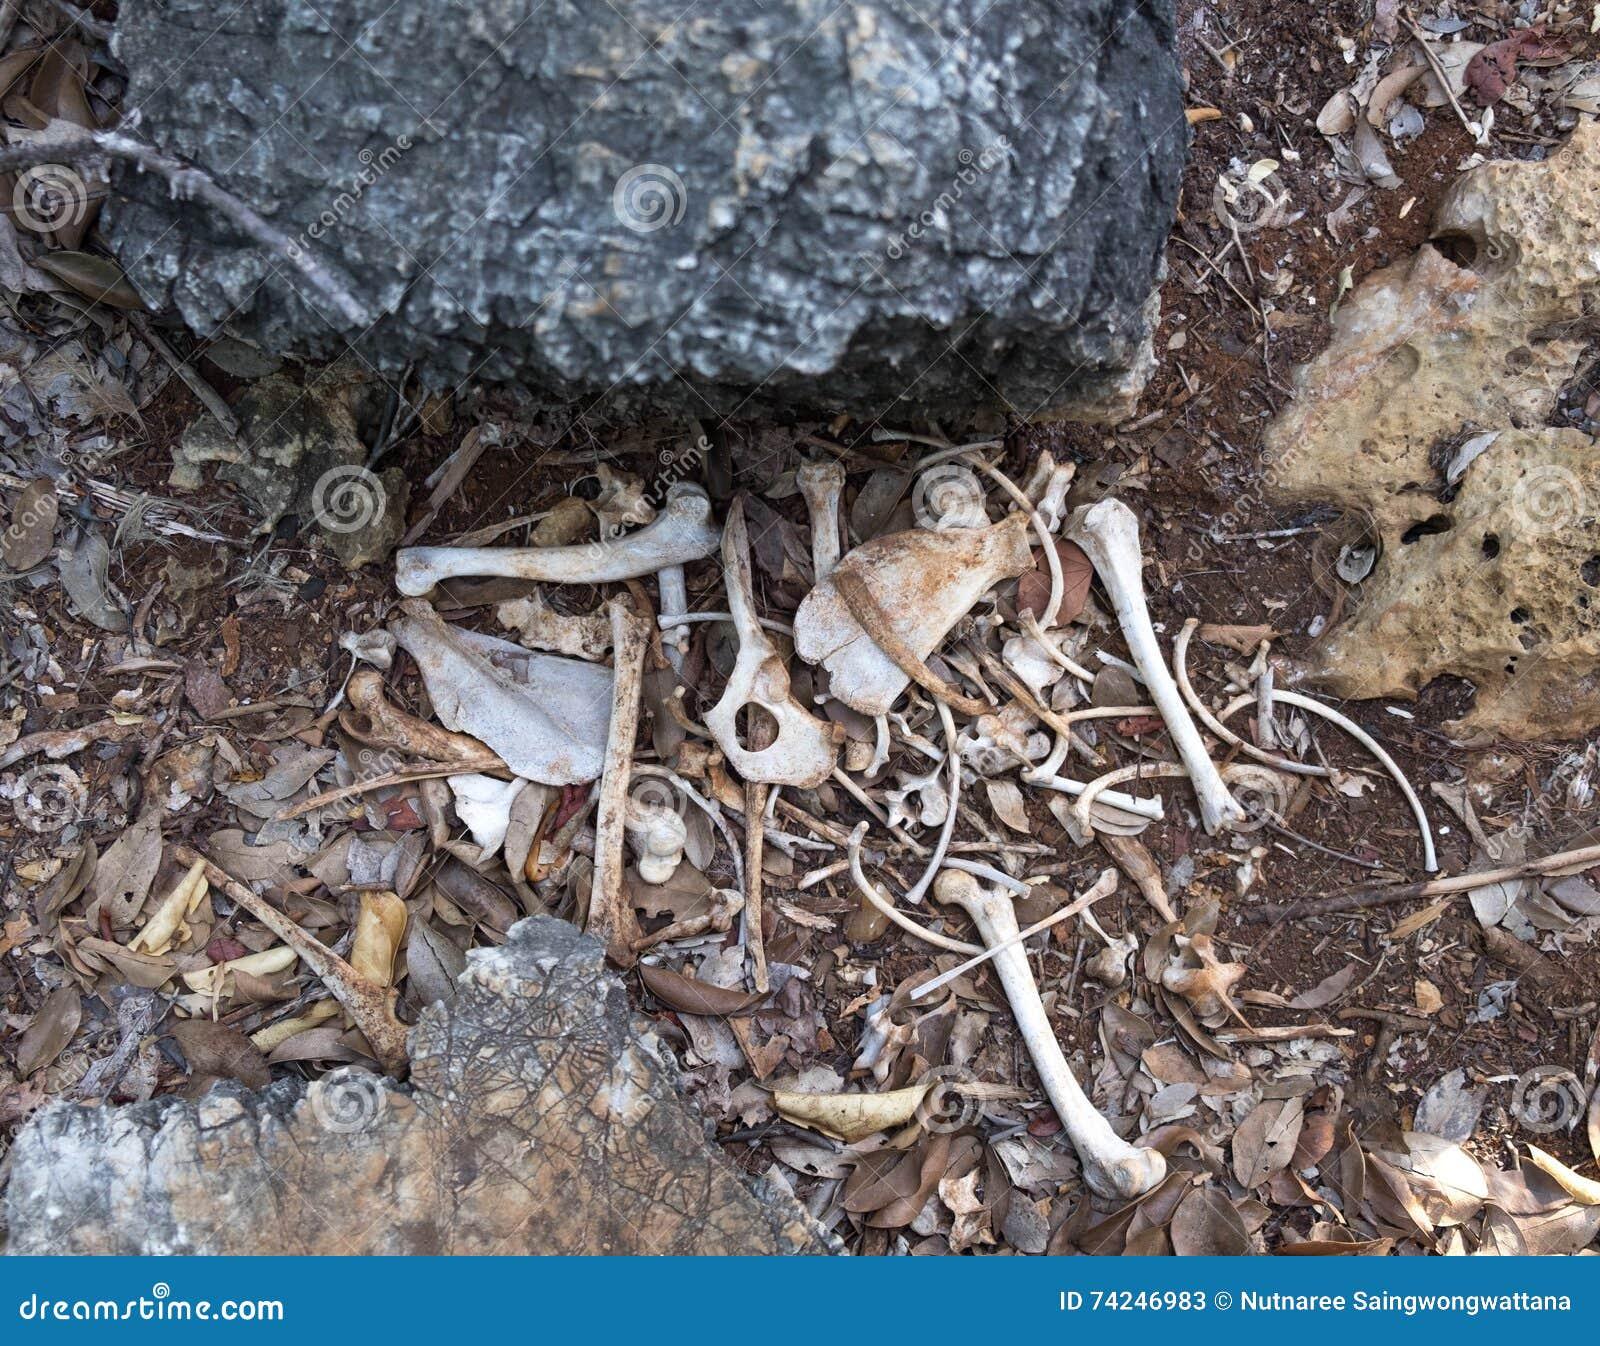 It Look Like Dog Bone Putting In Deep Forest Beside Rock Stock Image ...